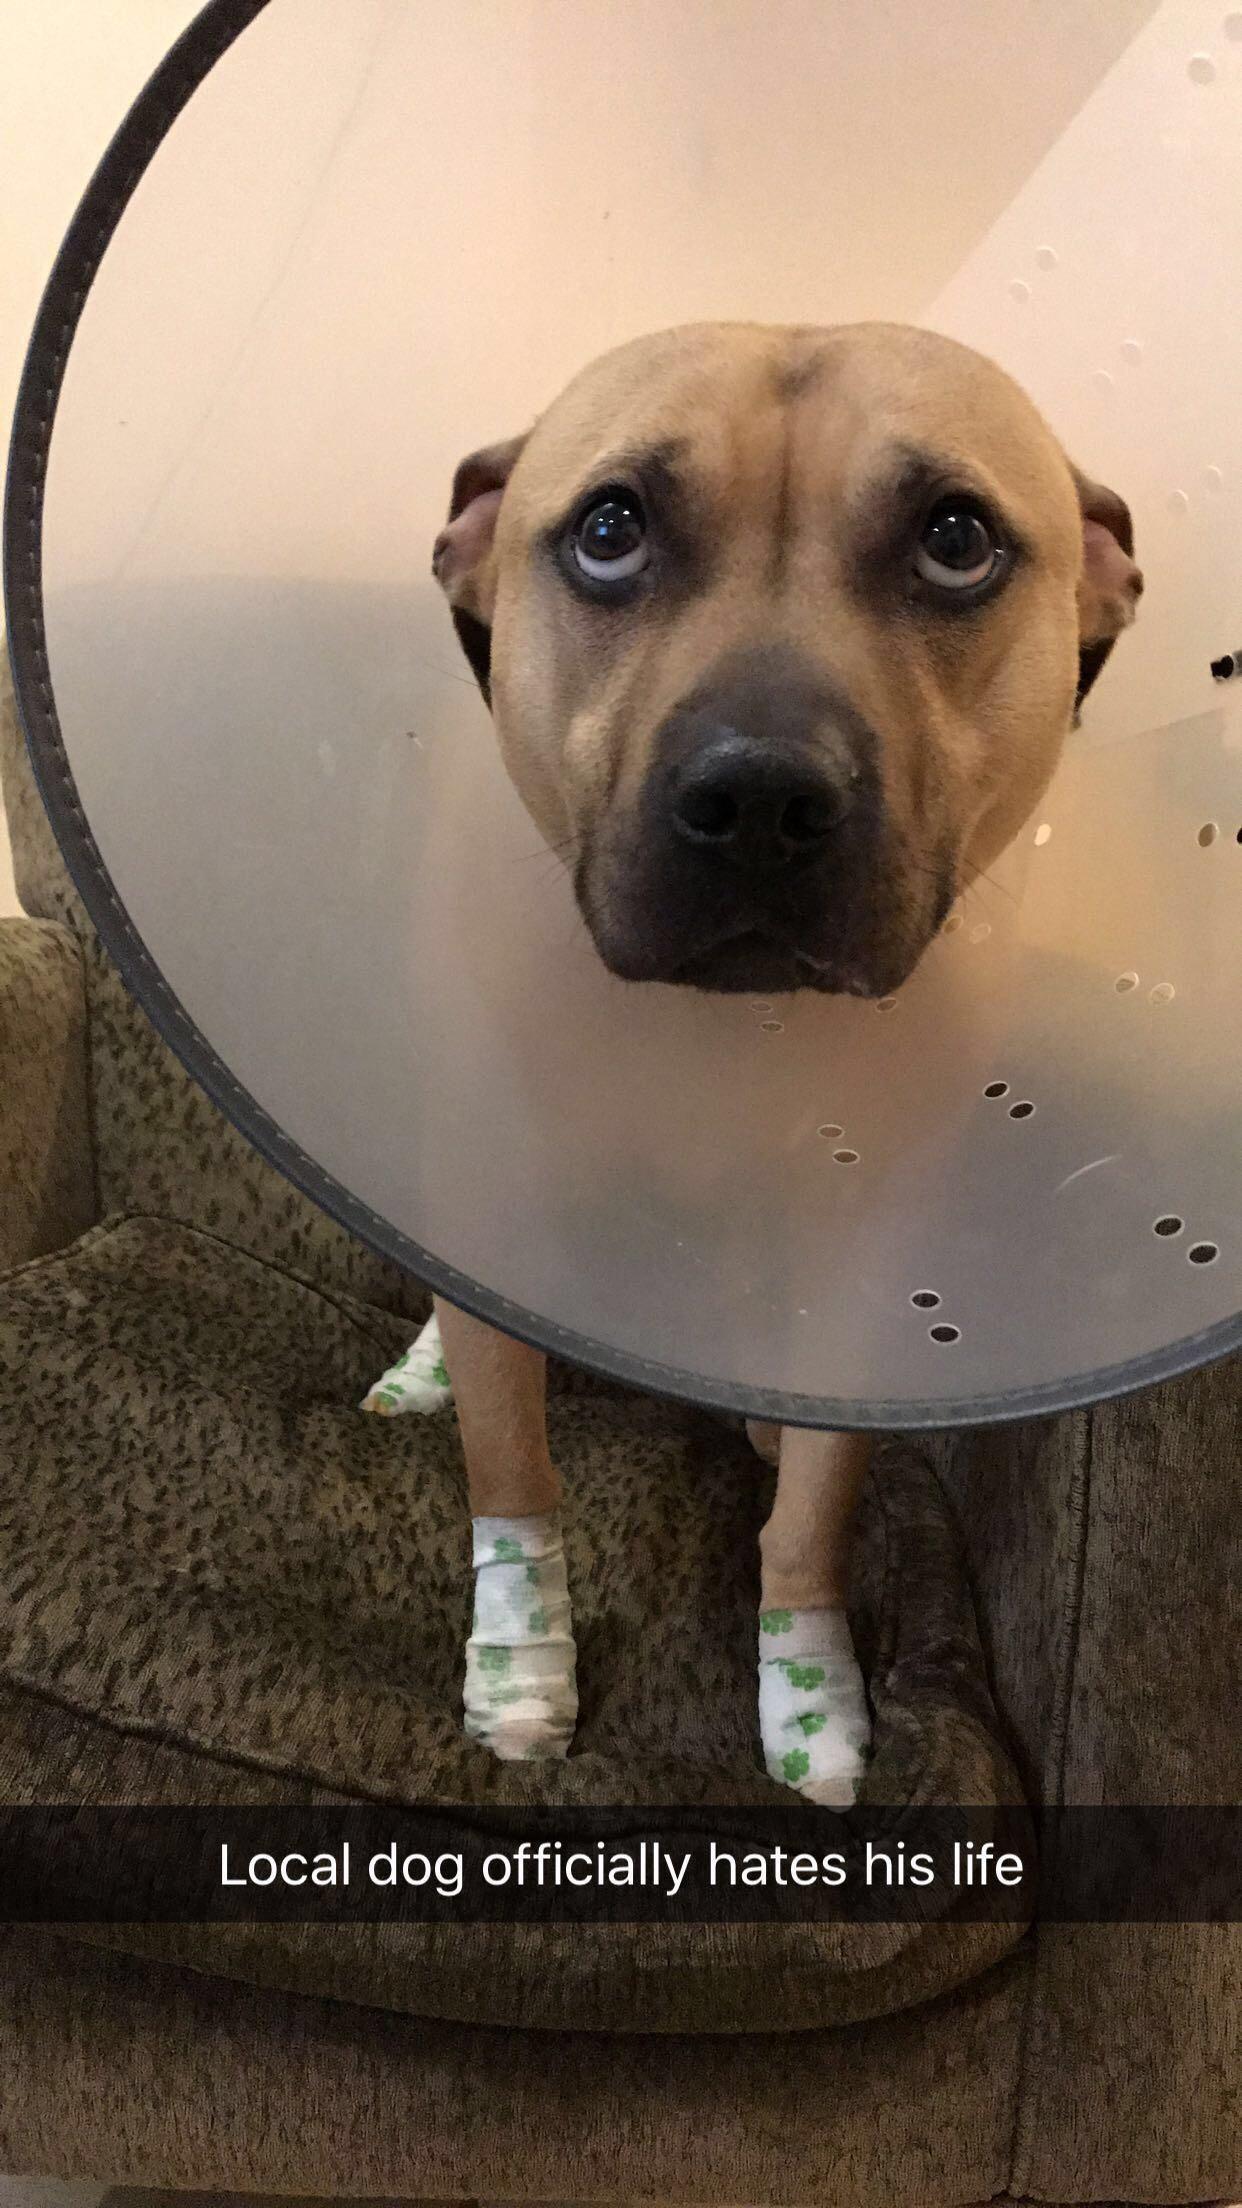 Pupper went too hard at the dog park iftrmbli cute uc